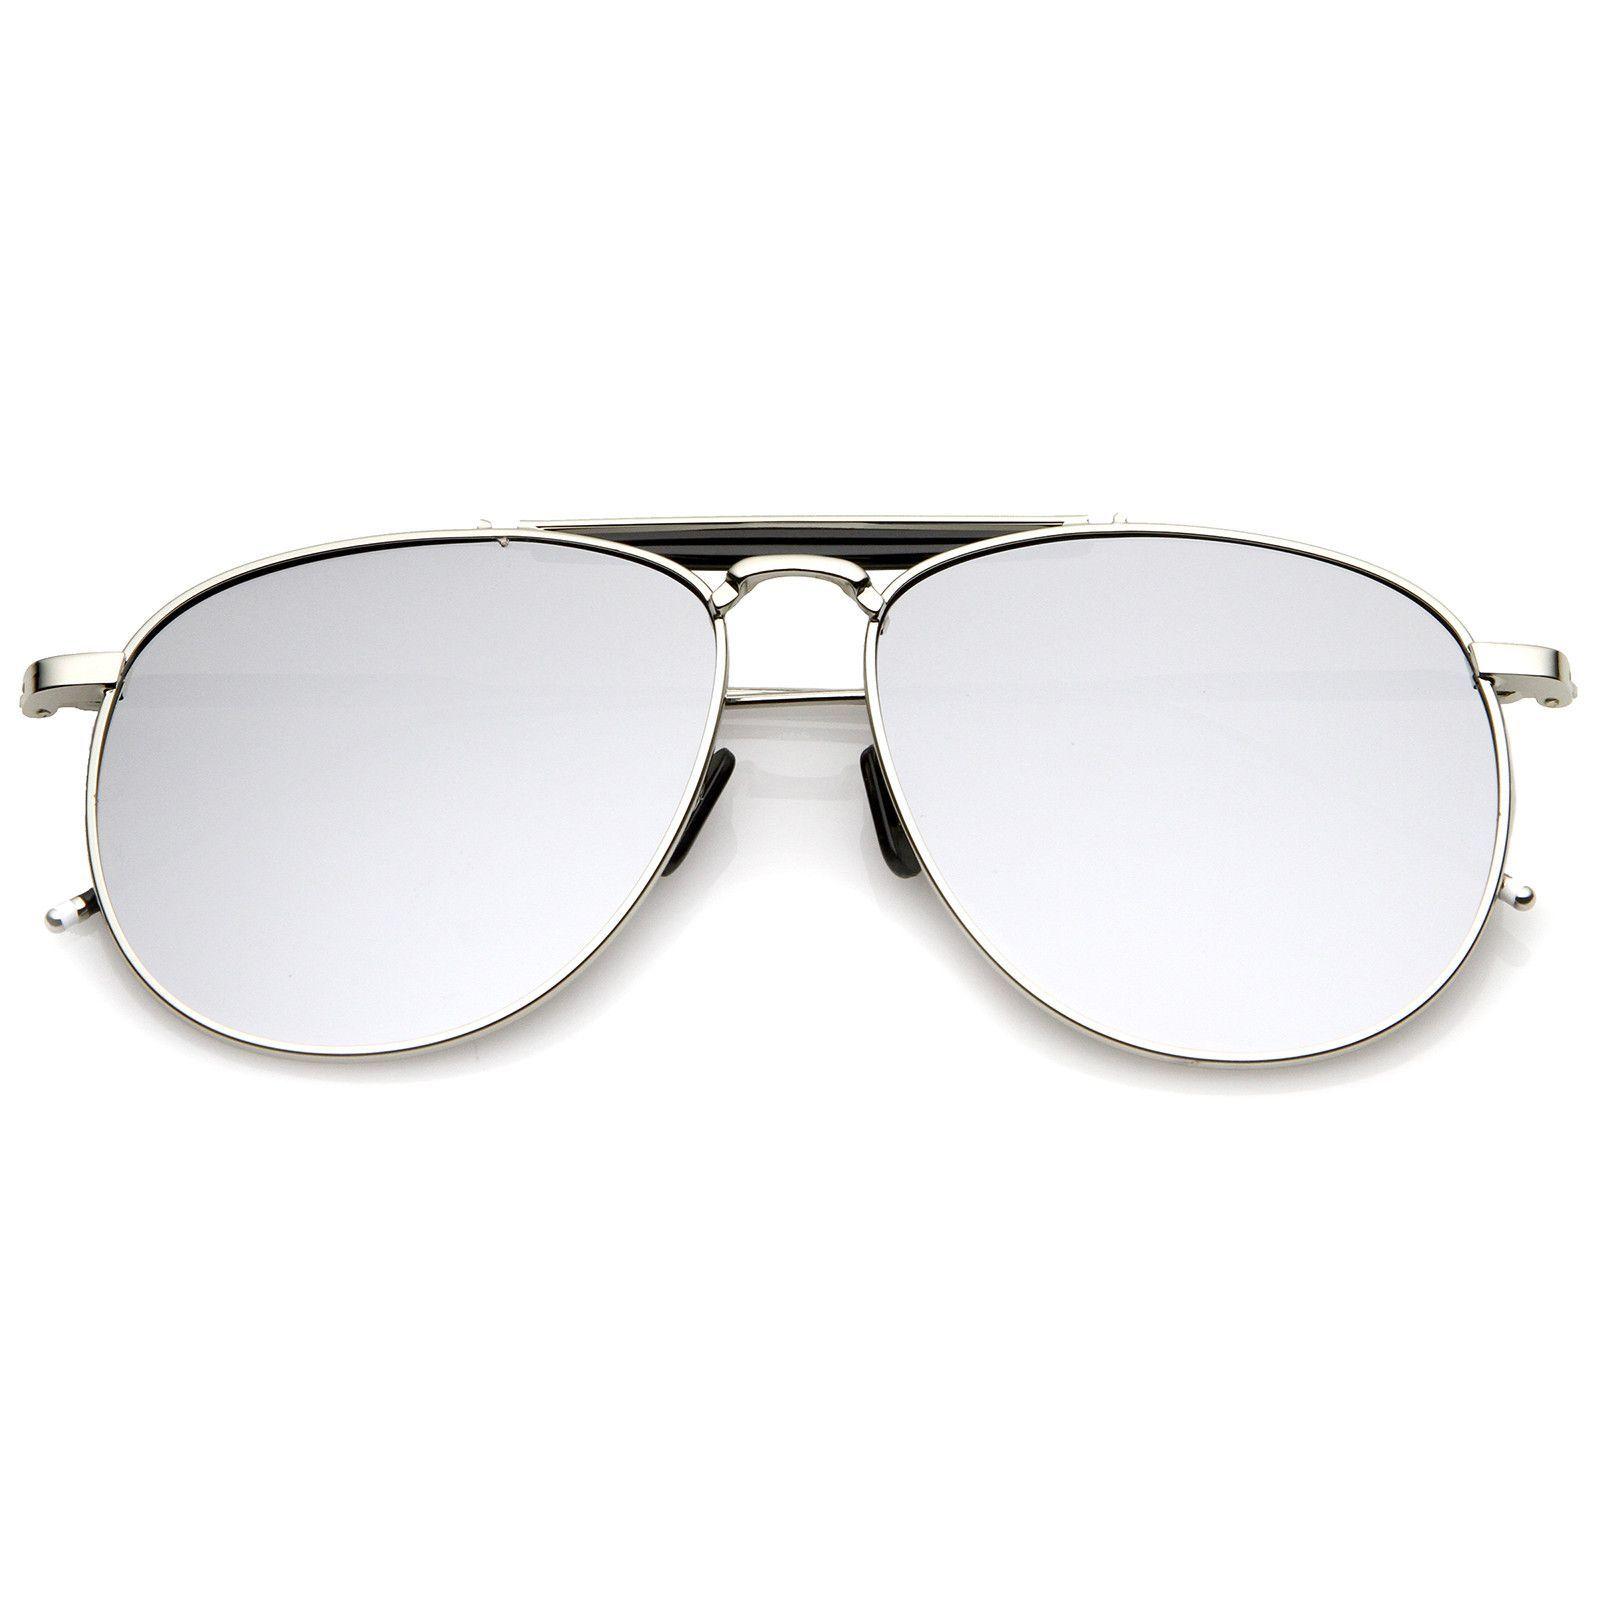 f216159a51a Oversize Metal Double Nose Bridge Slim Temple Colored Mirror Super Flat  Lens Aviator Sunglasses 57mm